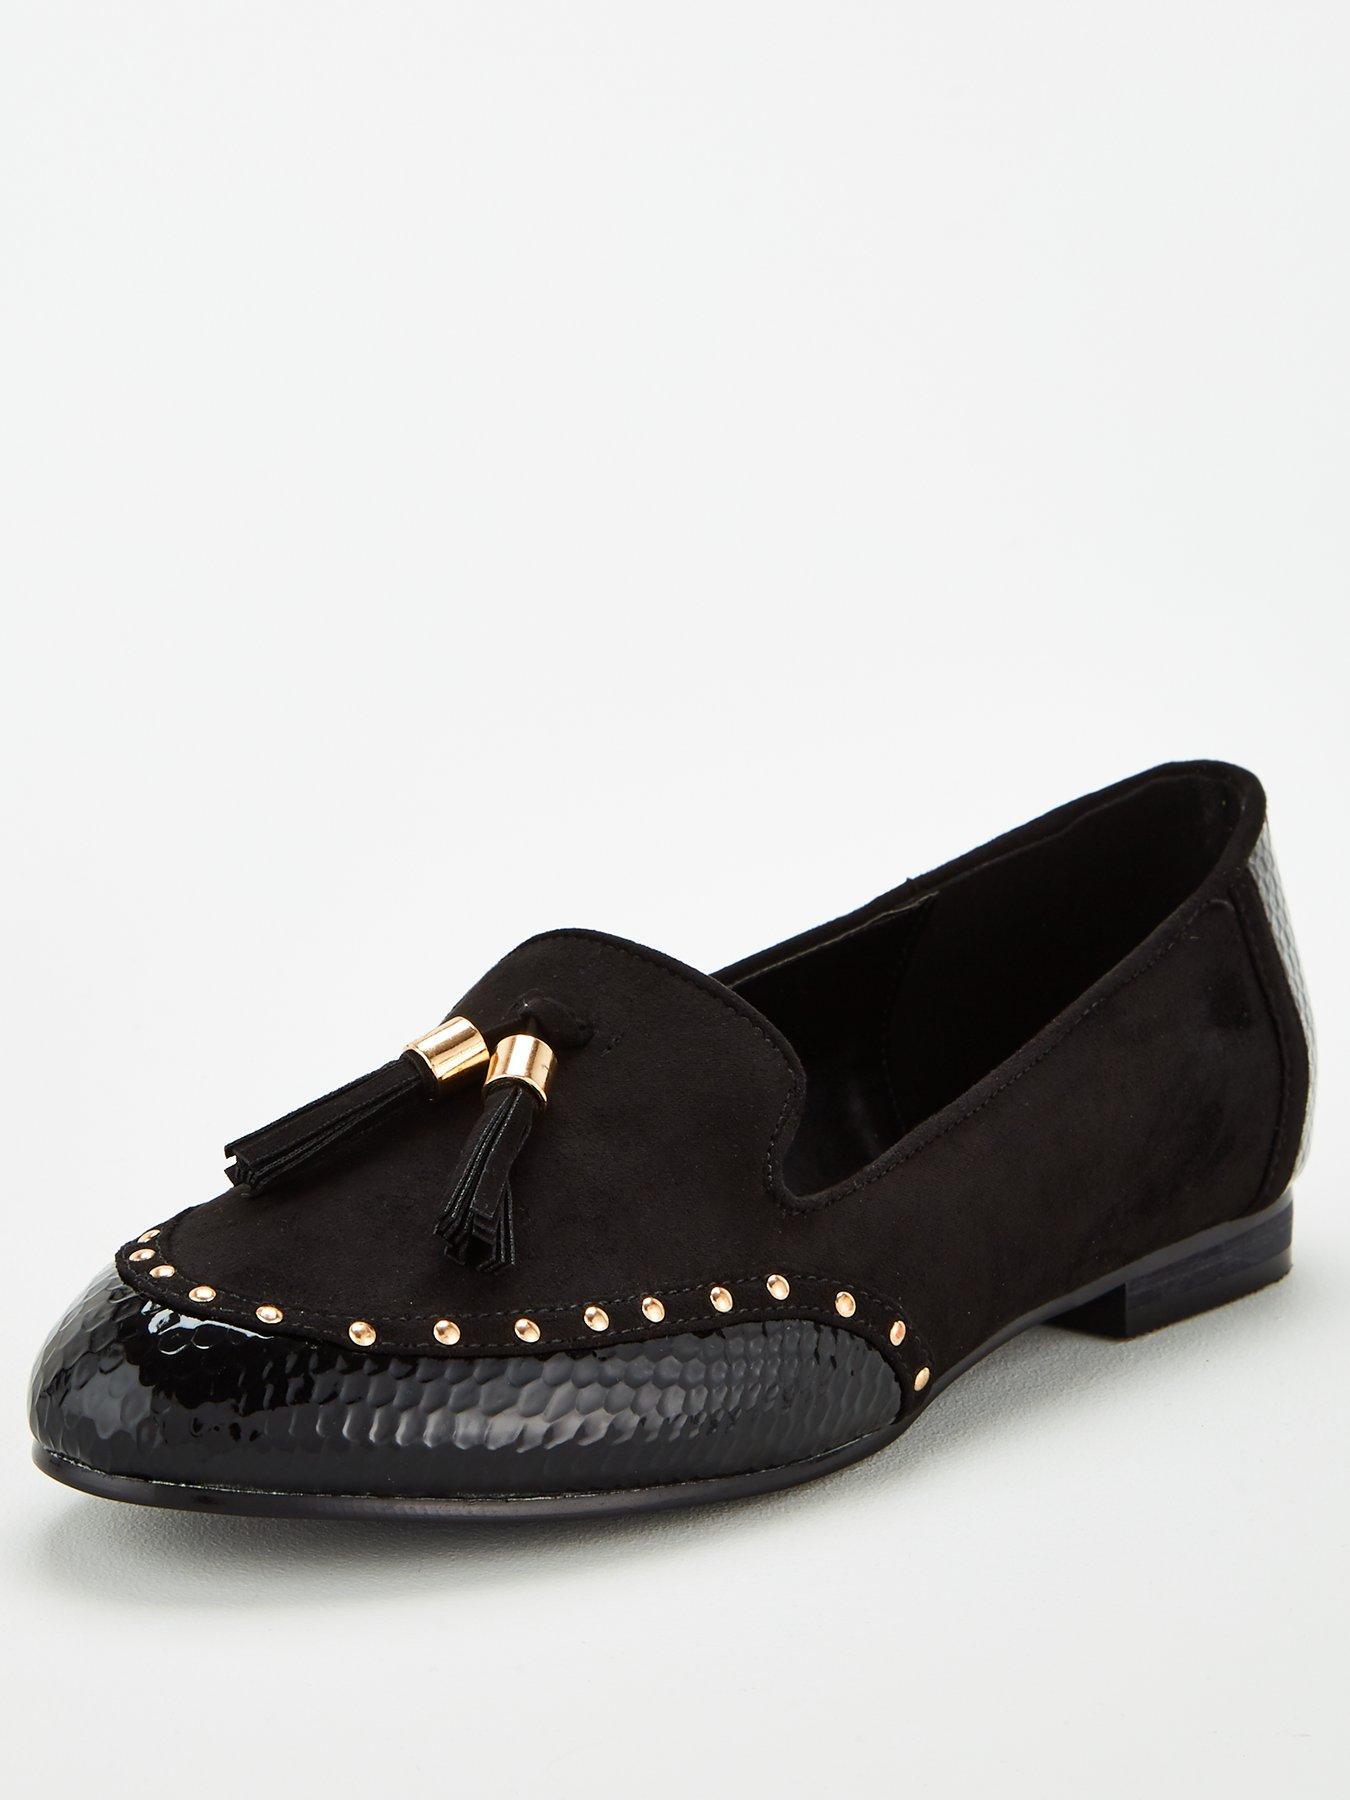 Wide Fit Flat Shoes | Women